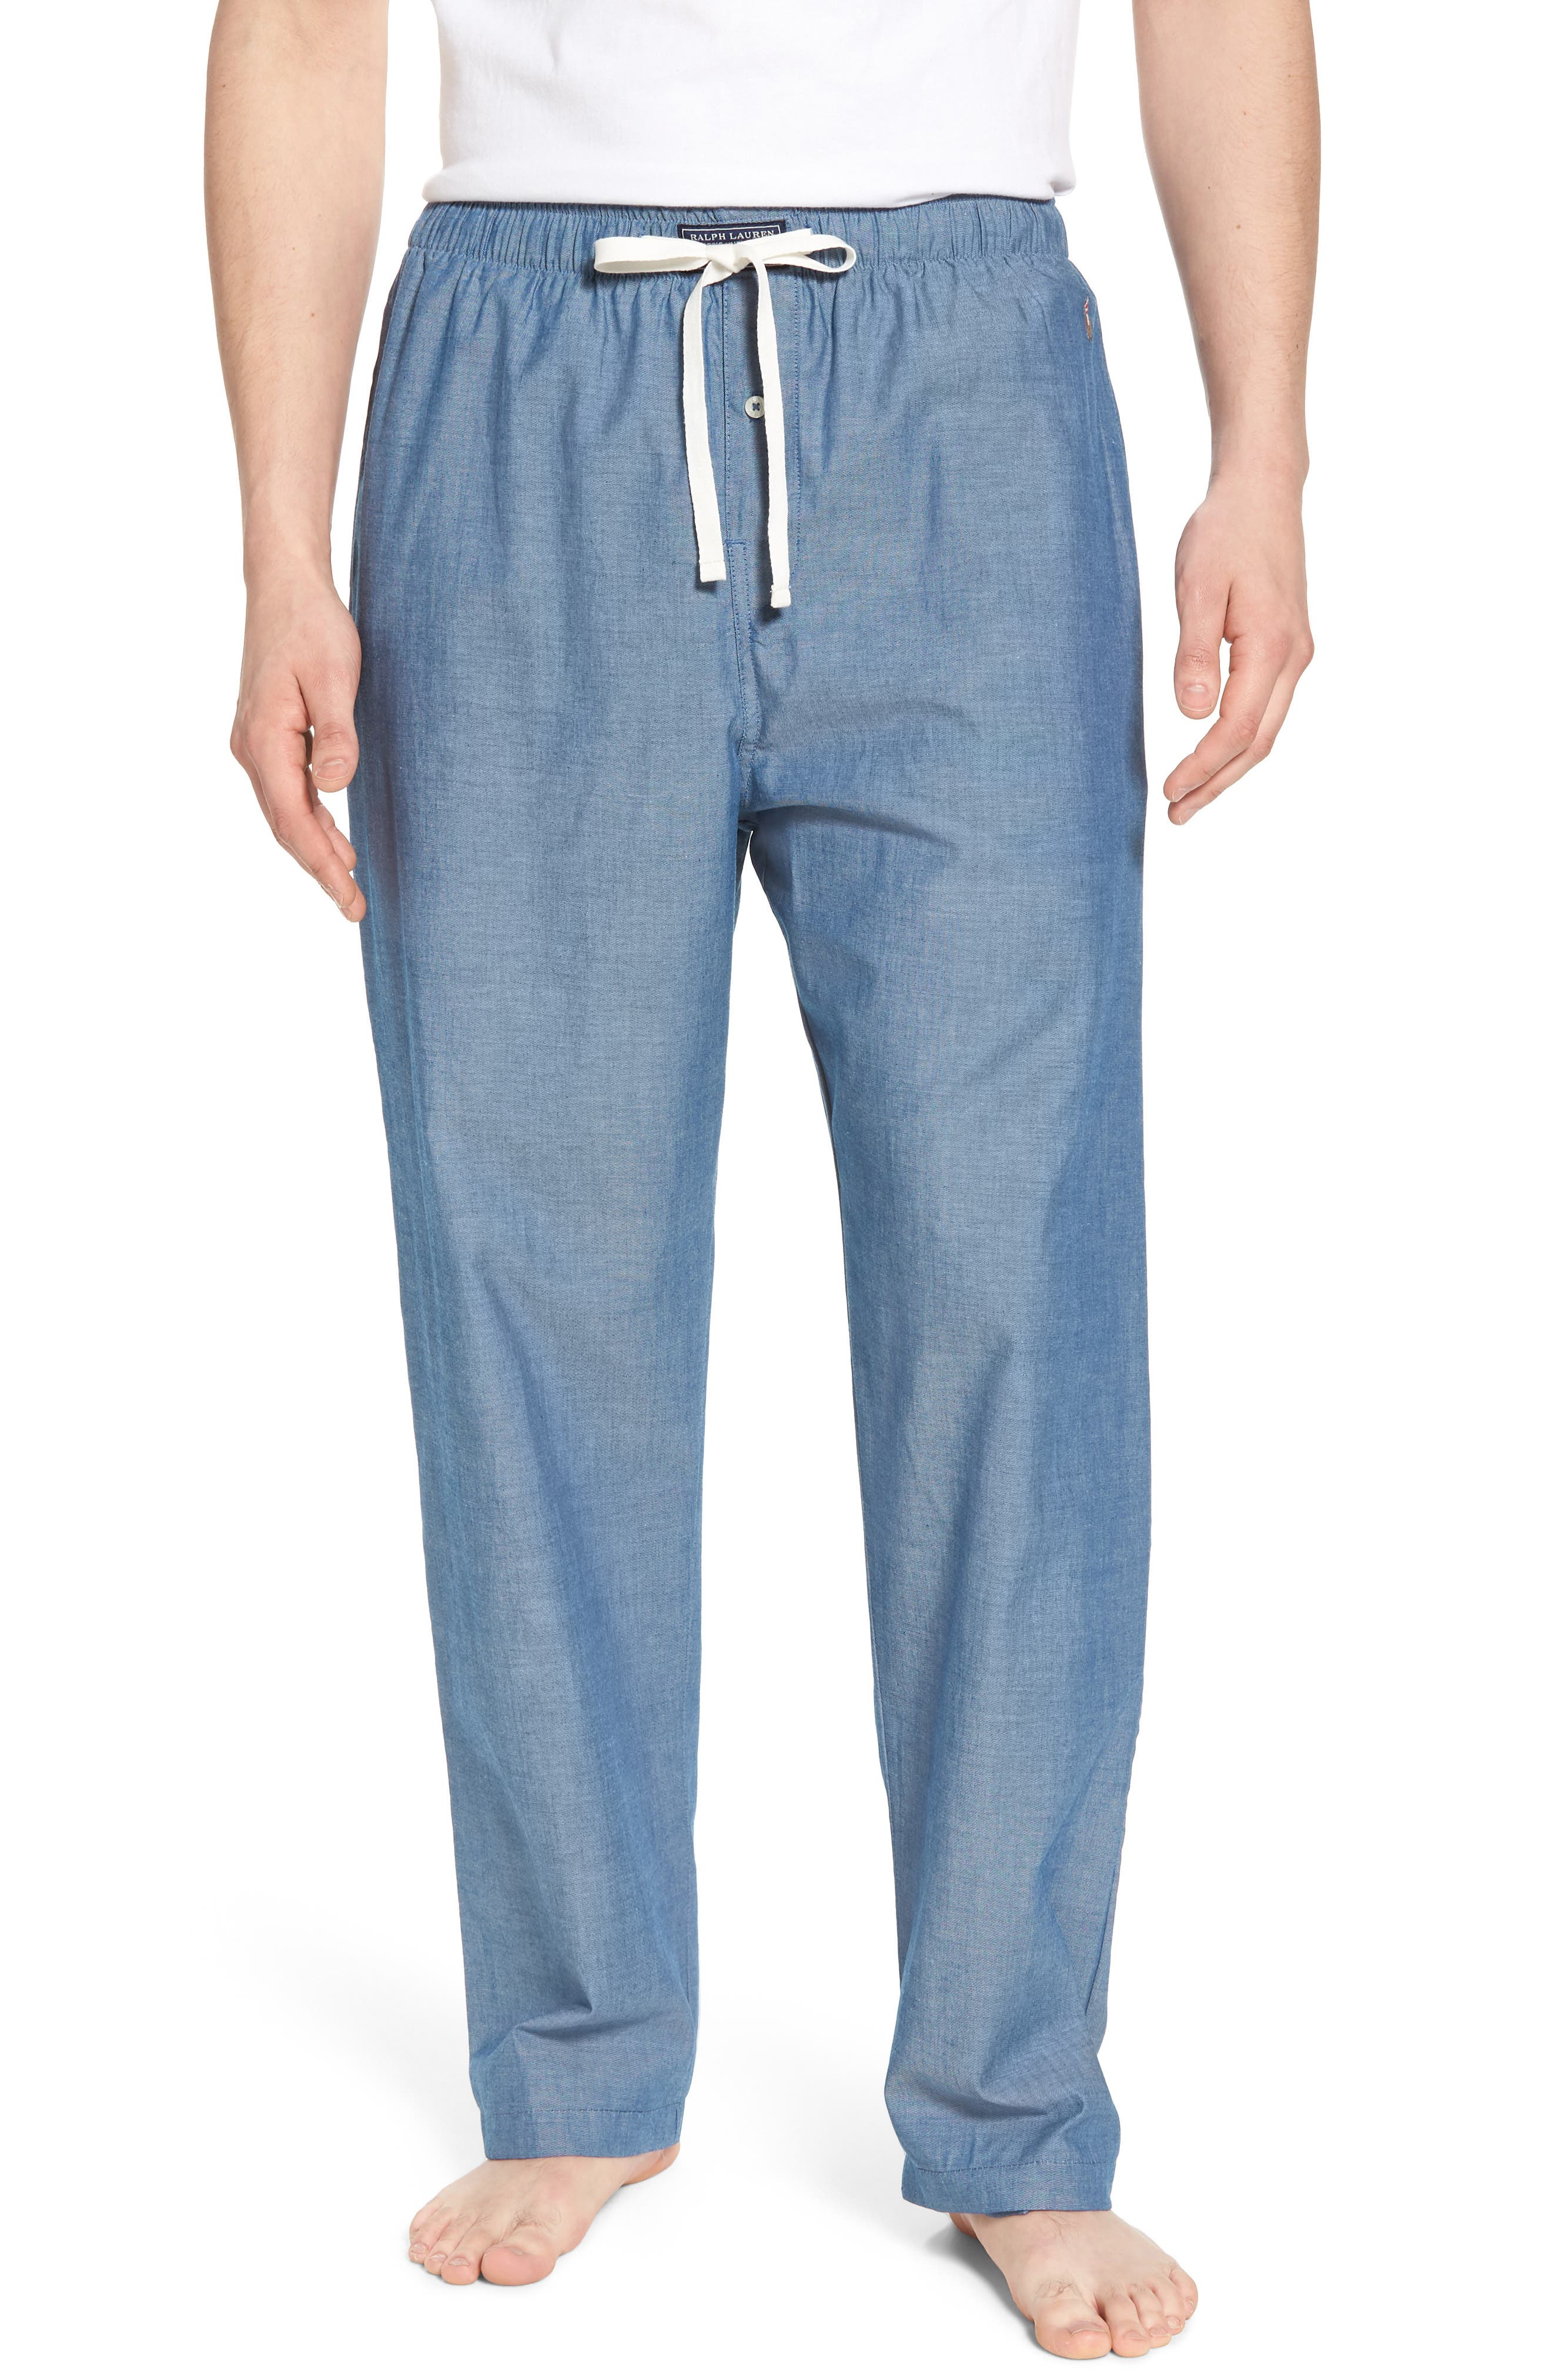 Chambray Woven Lounge Pants,                         Main,                         color, Medium Indigo/ Dark Indigo